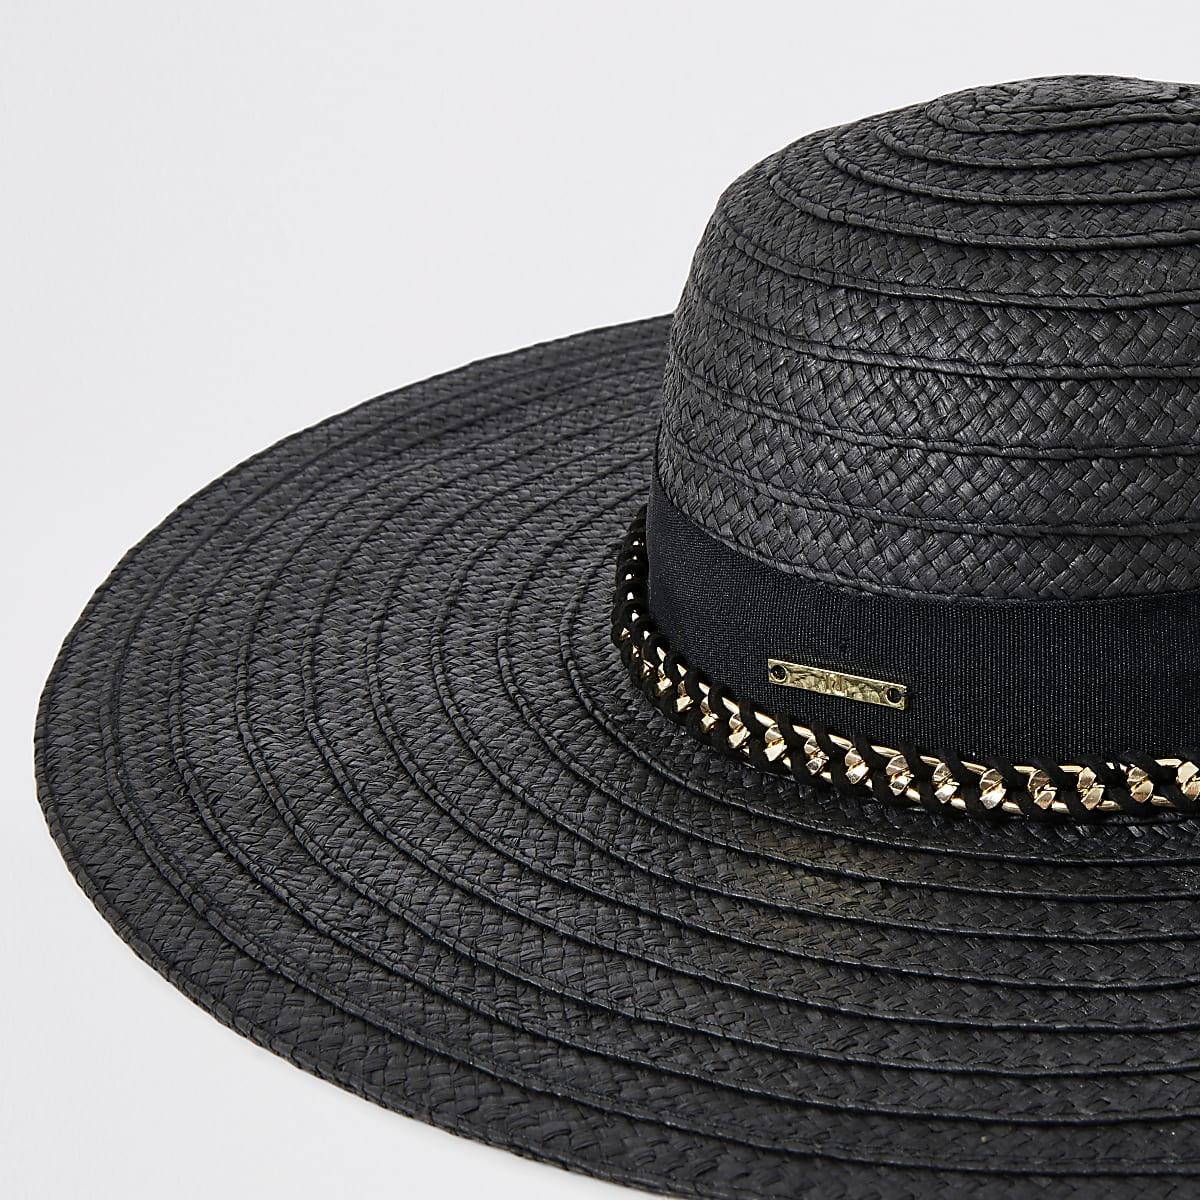 4a25834e73c4e Black oversized floppy straw hat - Hats - Accessories - women